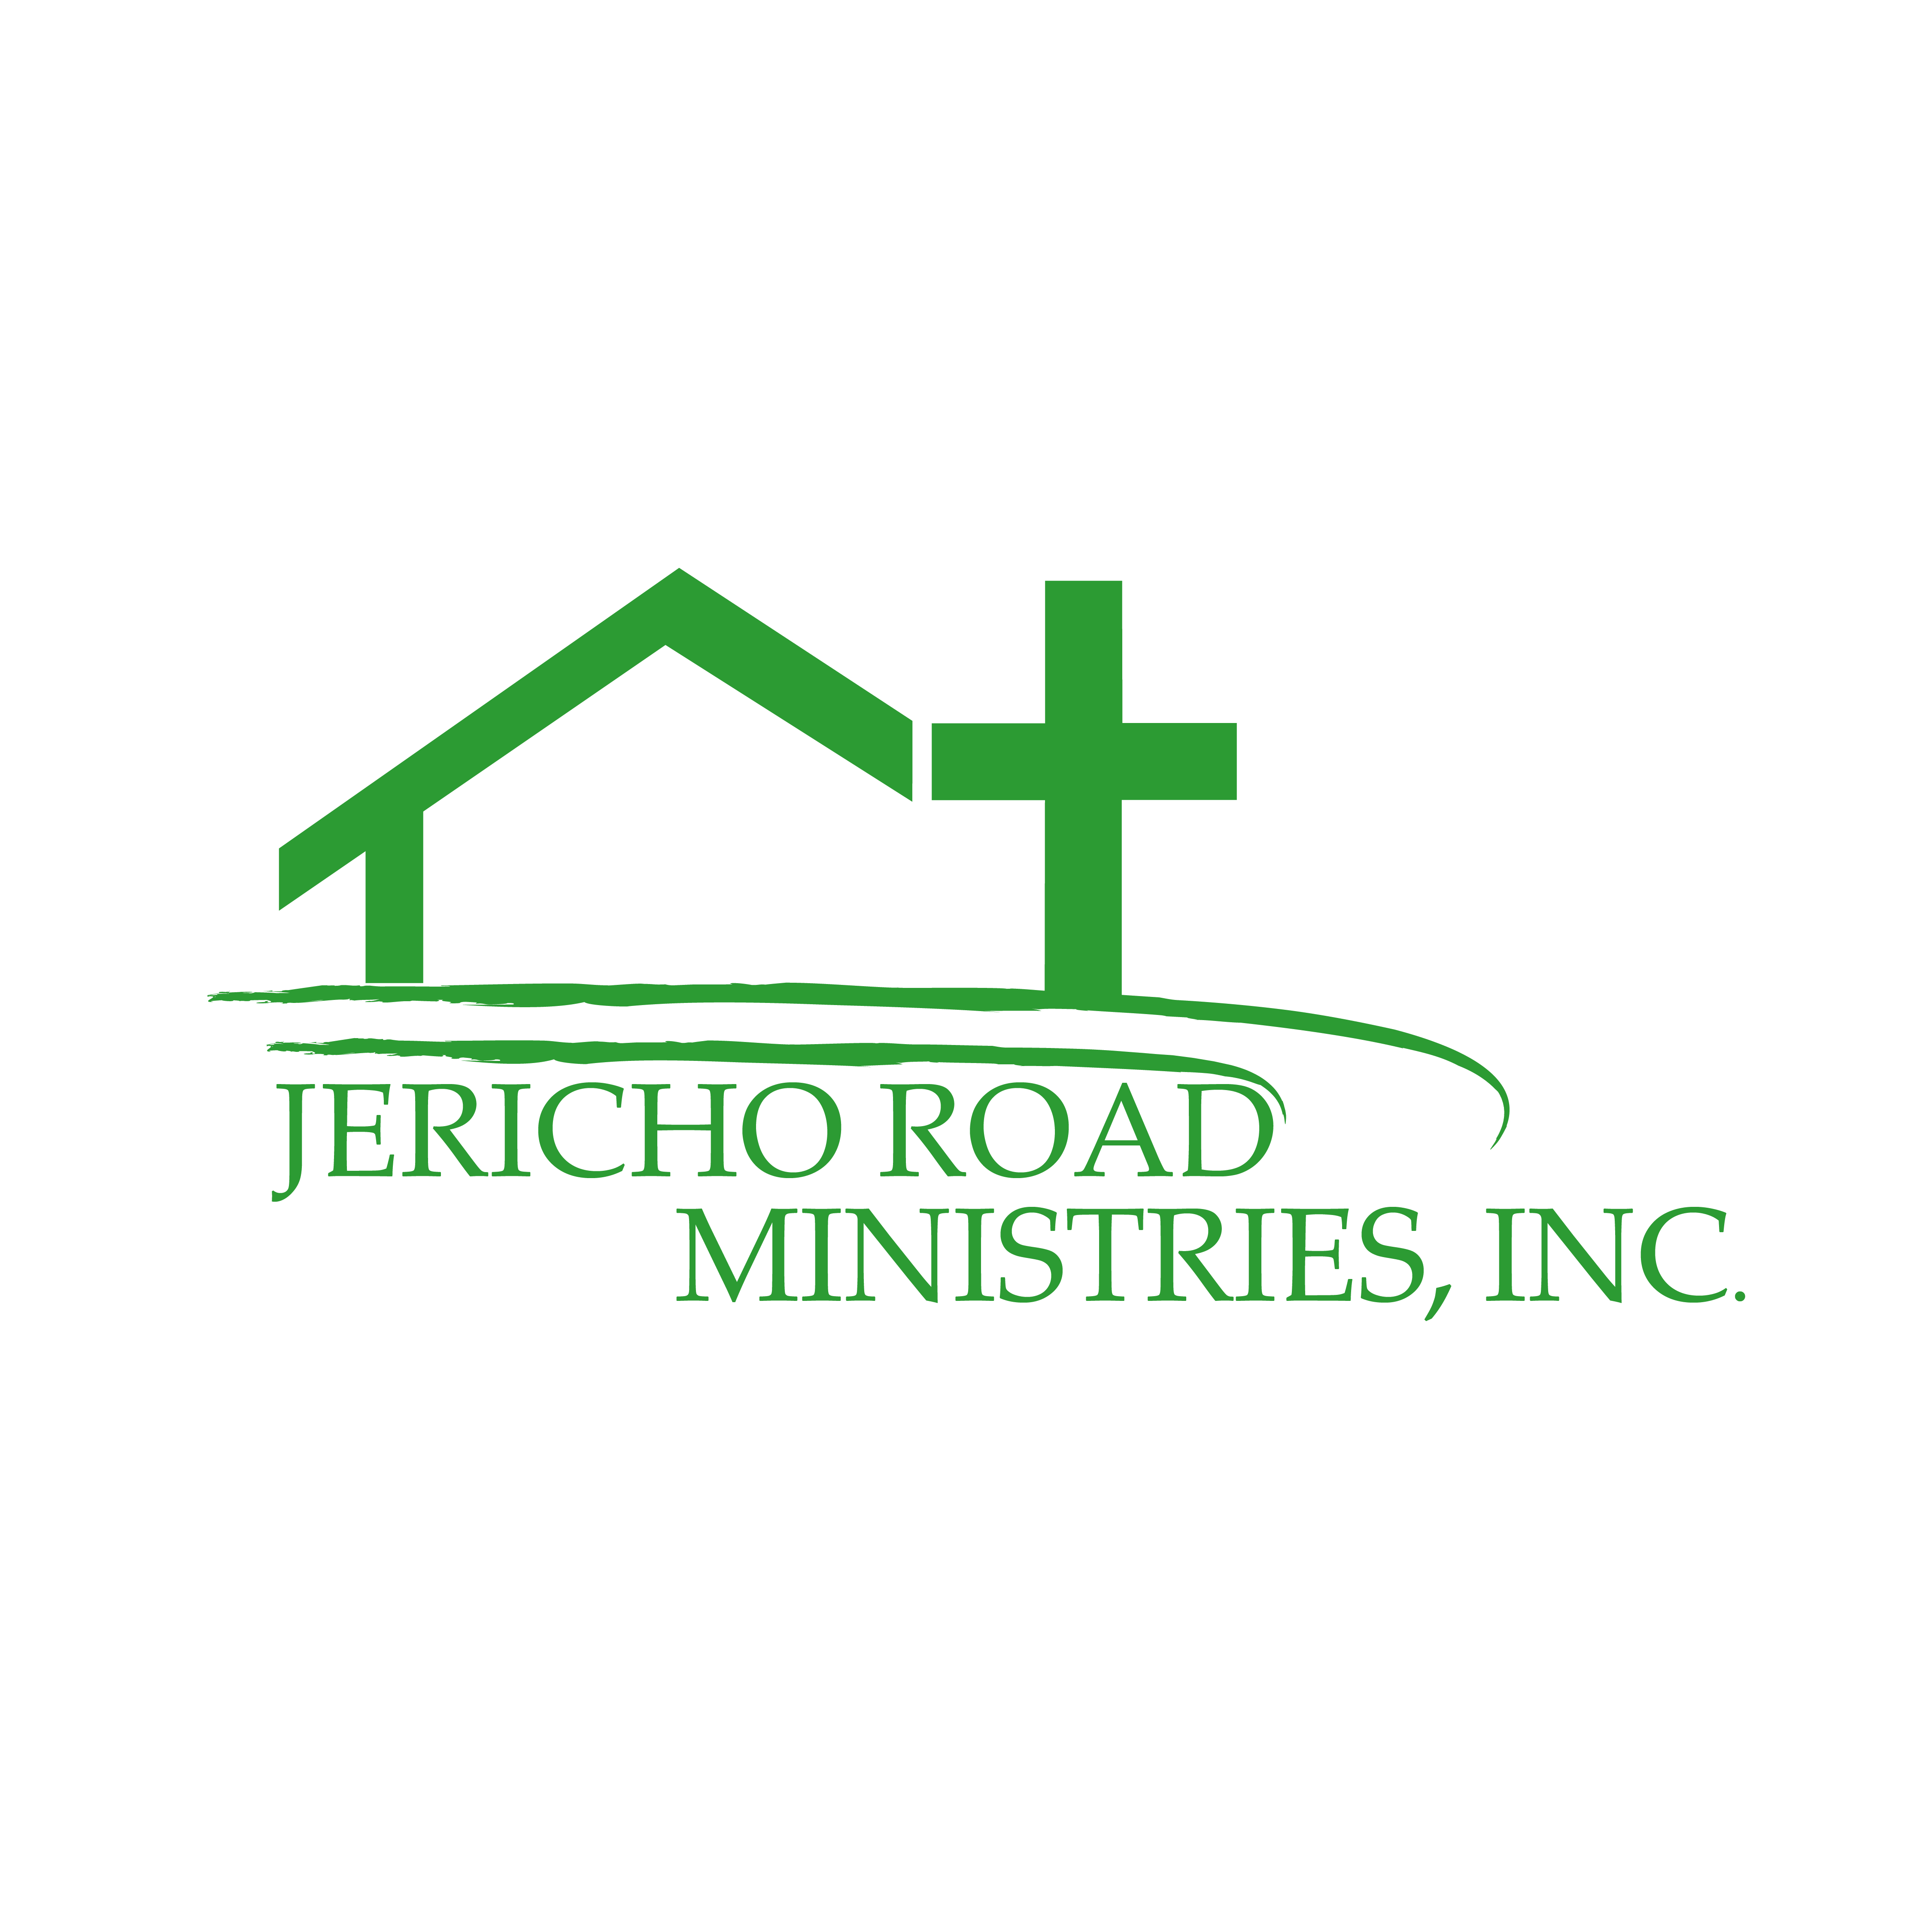 Jericho Road Ministries, Inc.